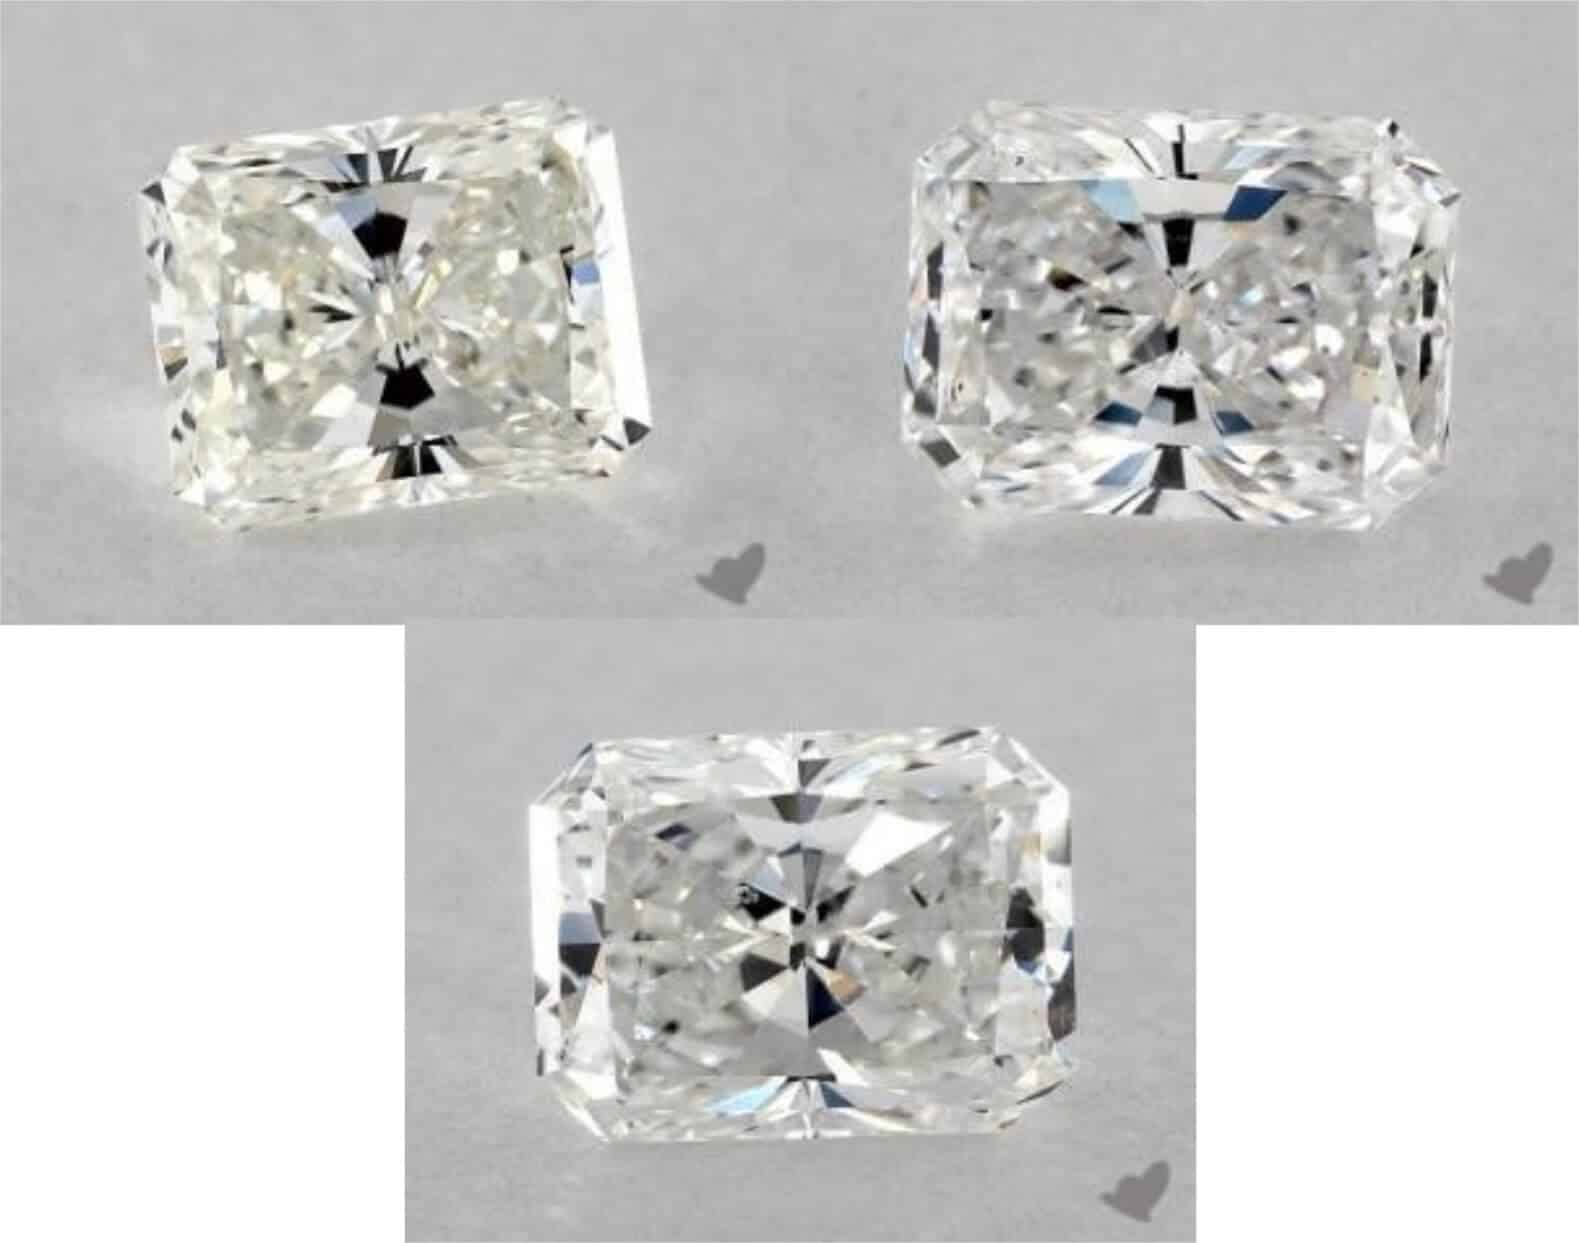 Bow Tie Diamond Radiant Cut Jewelry Guide